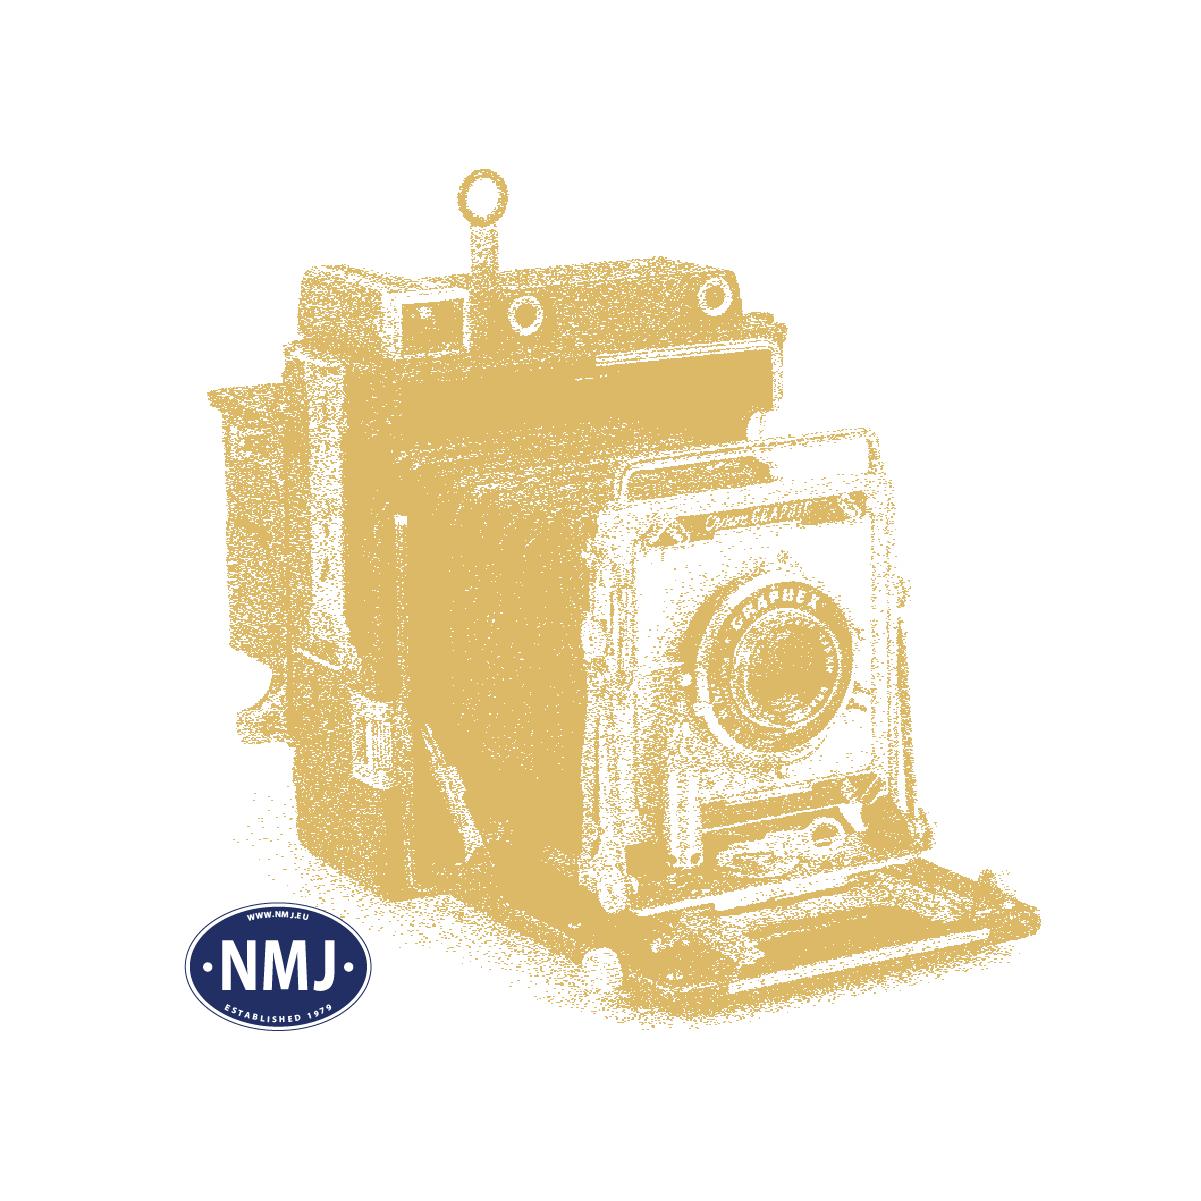 NMJS30b362 - NMJ Superline NSB Type 30b 362